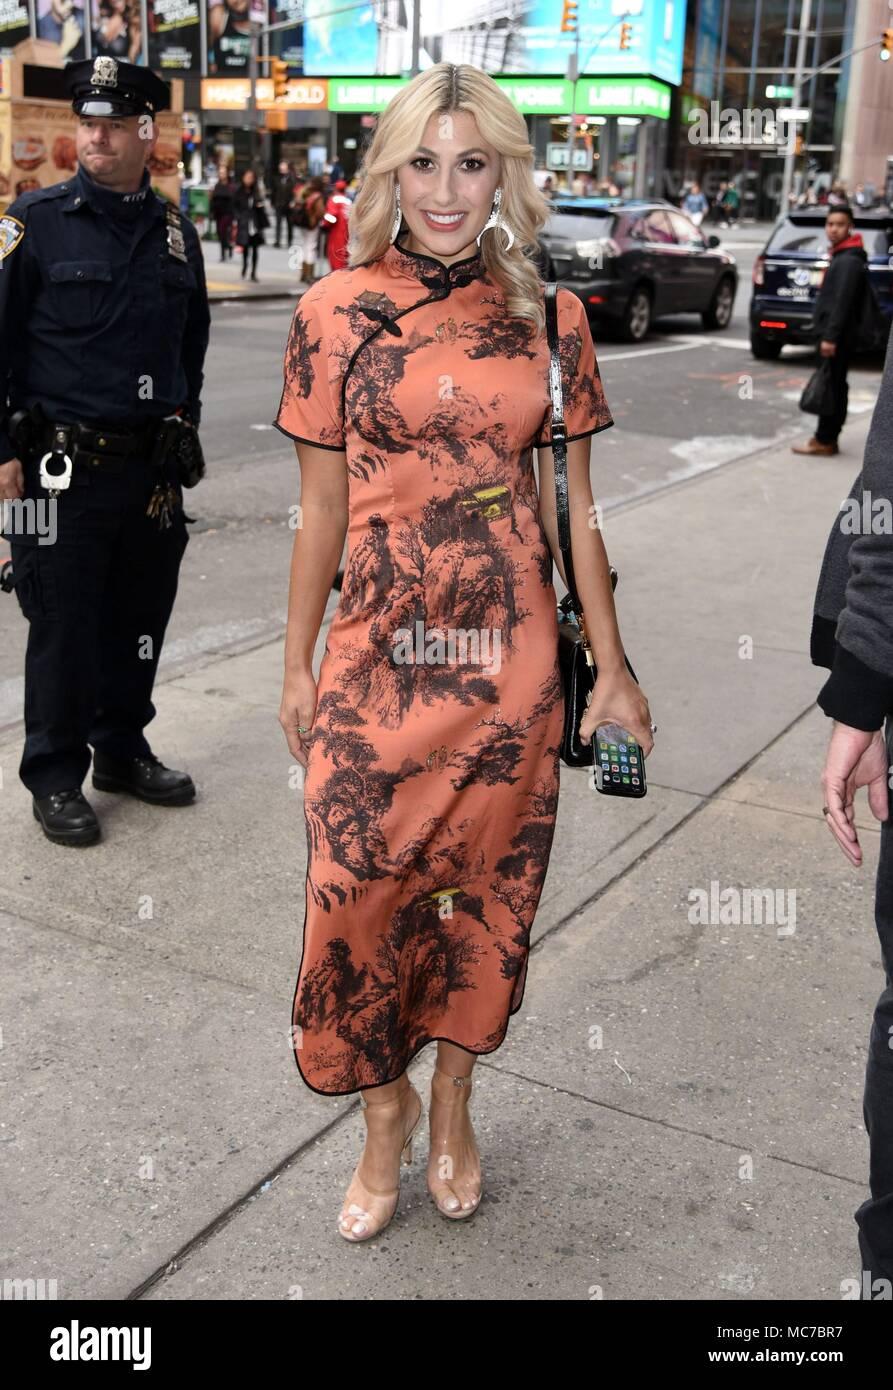 Celebrity Emma Slater nude photos 2019